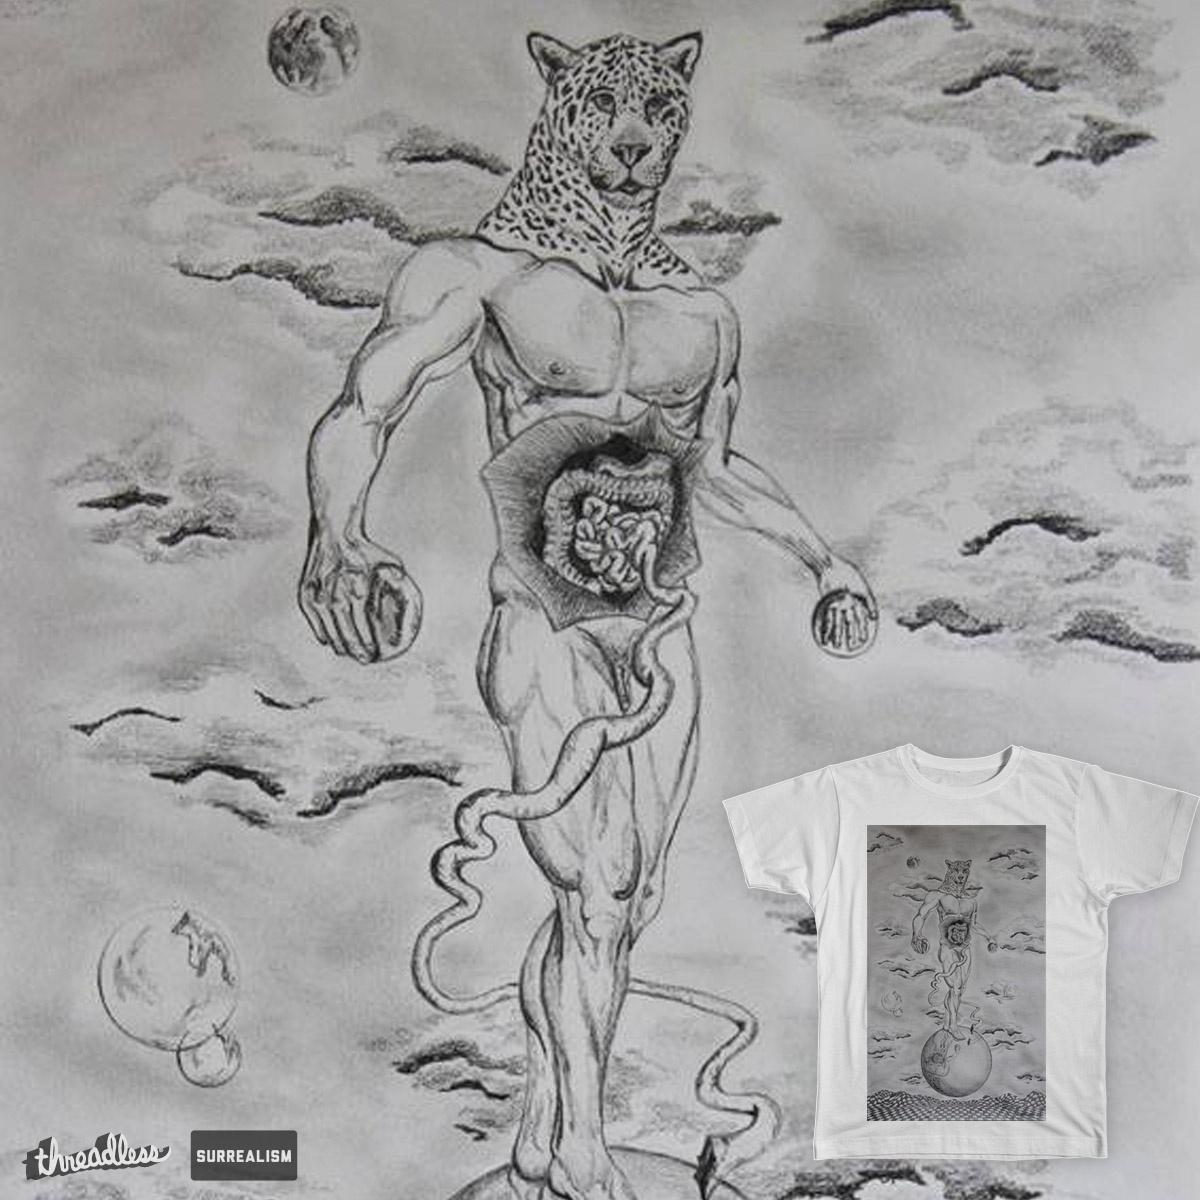 Self destruction by Fersepulveda on Threadless